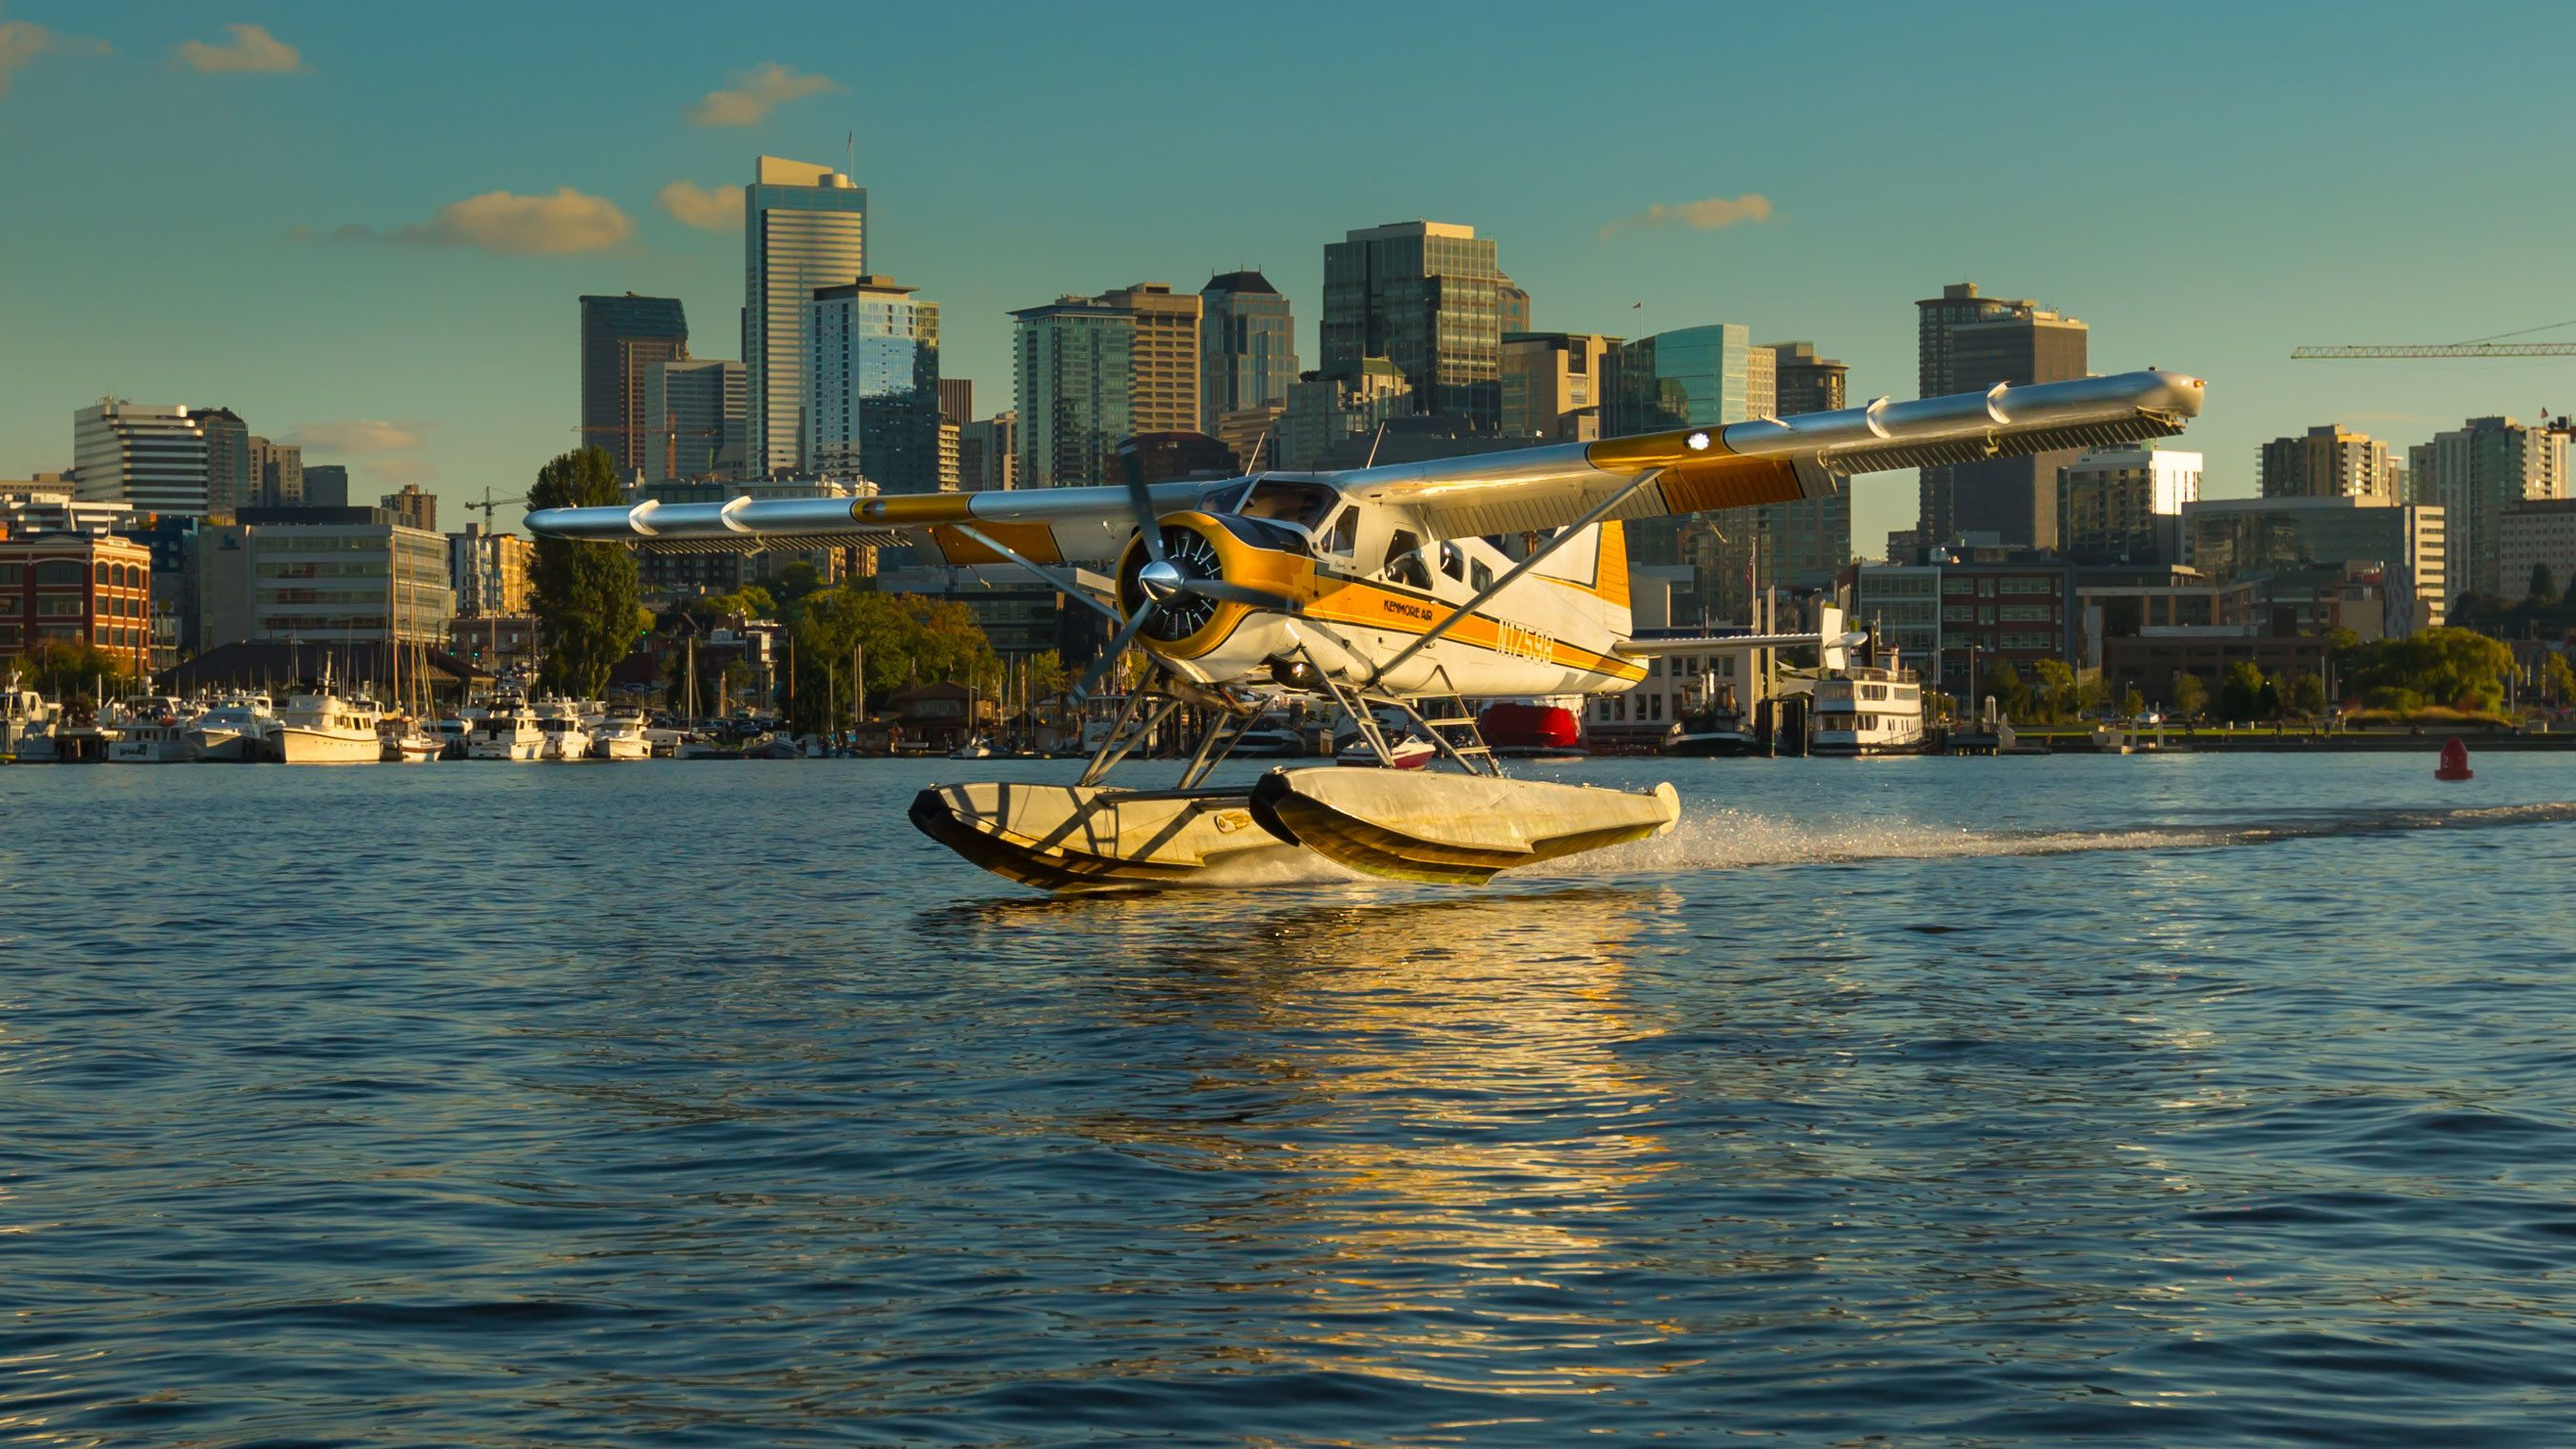 Seaplane landing on the water in Seattle Harbor